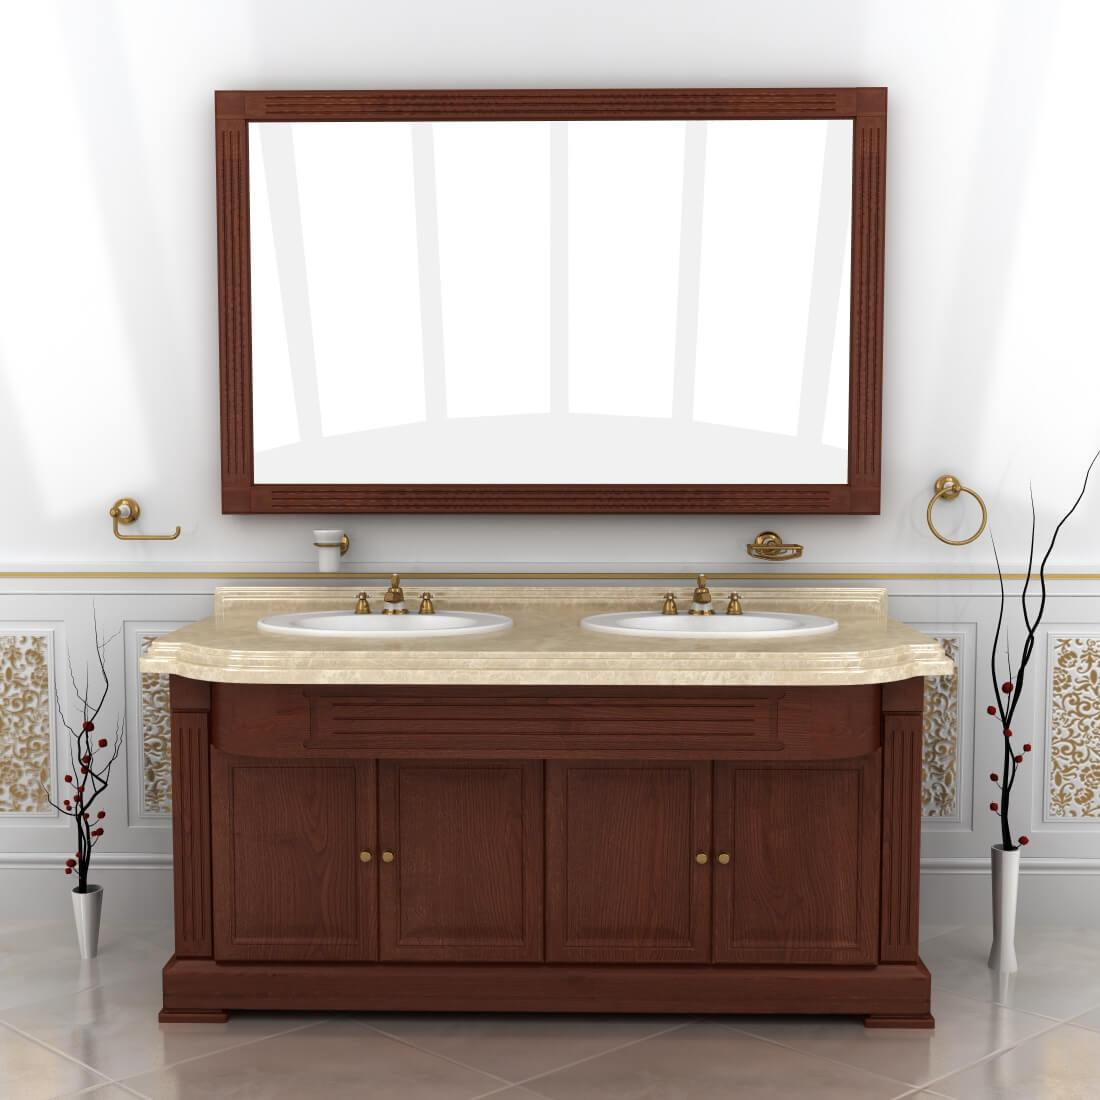 тумбы с зеркалом в ванную Ваші Меблі серия Мрамор